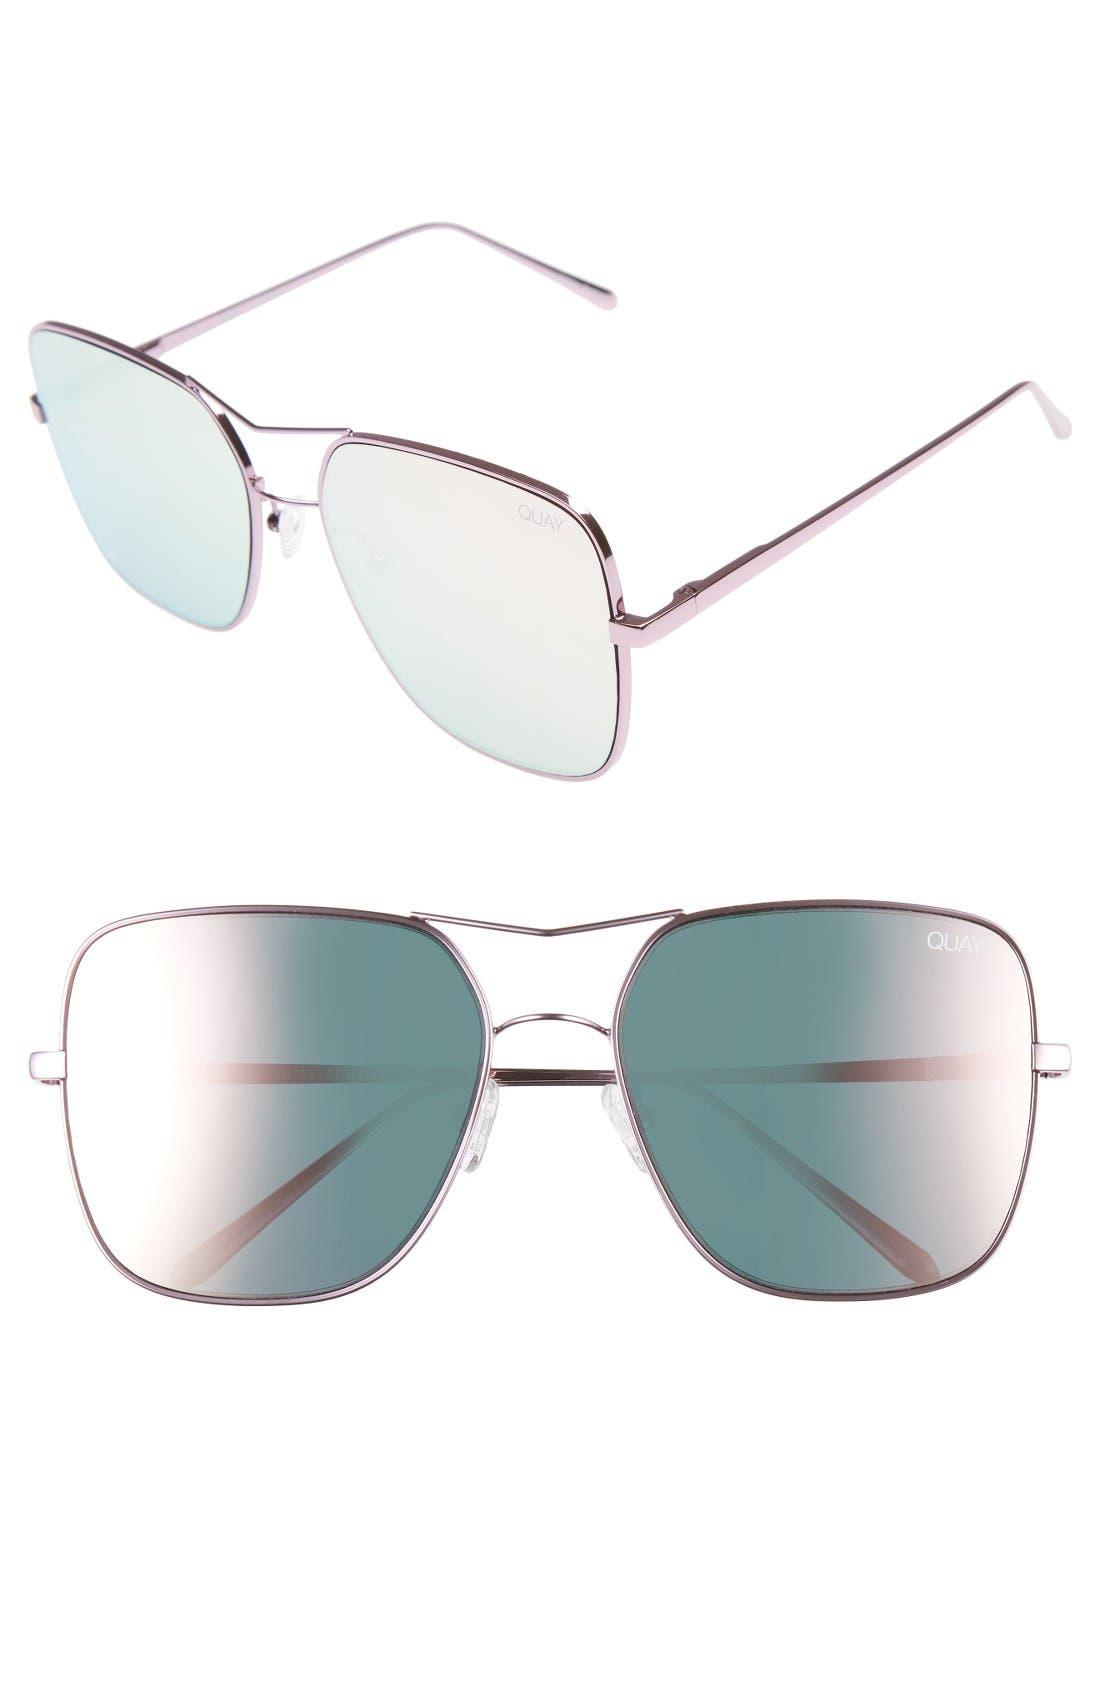 Alternate Image 1 Selected - Quay Australia Stop & Stare 58mm Square Sunglasses